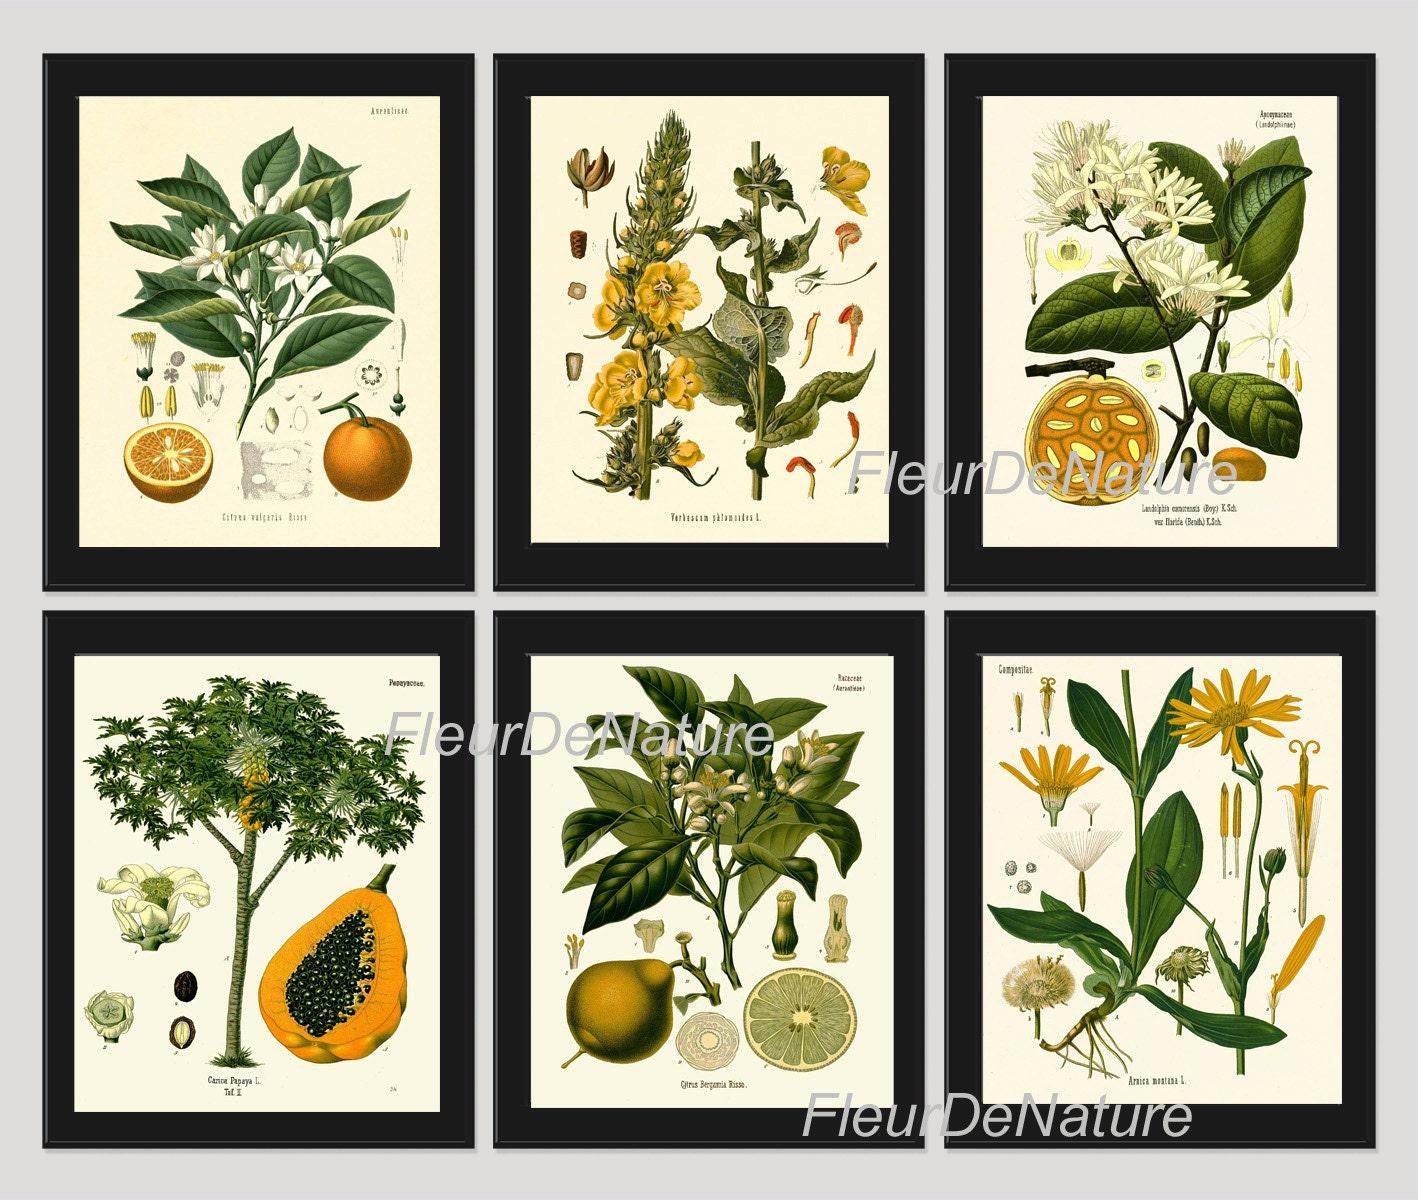 BOTANICAL PRINT Kohler 8x10 Botanical Art Print 65 Beautiful Blooming Apple Tree Fowers Fruit Print Garden Nature to Frame Home Decor